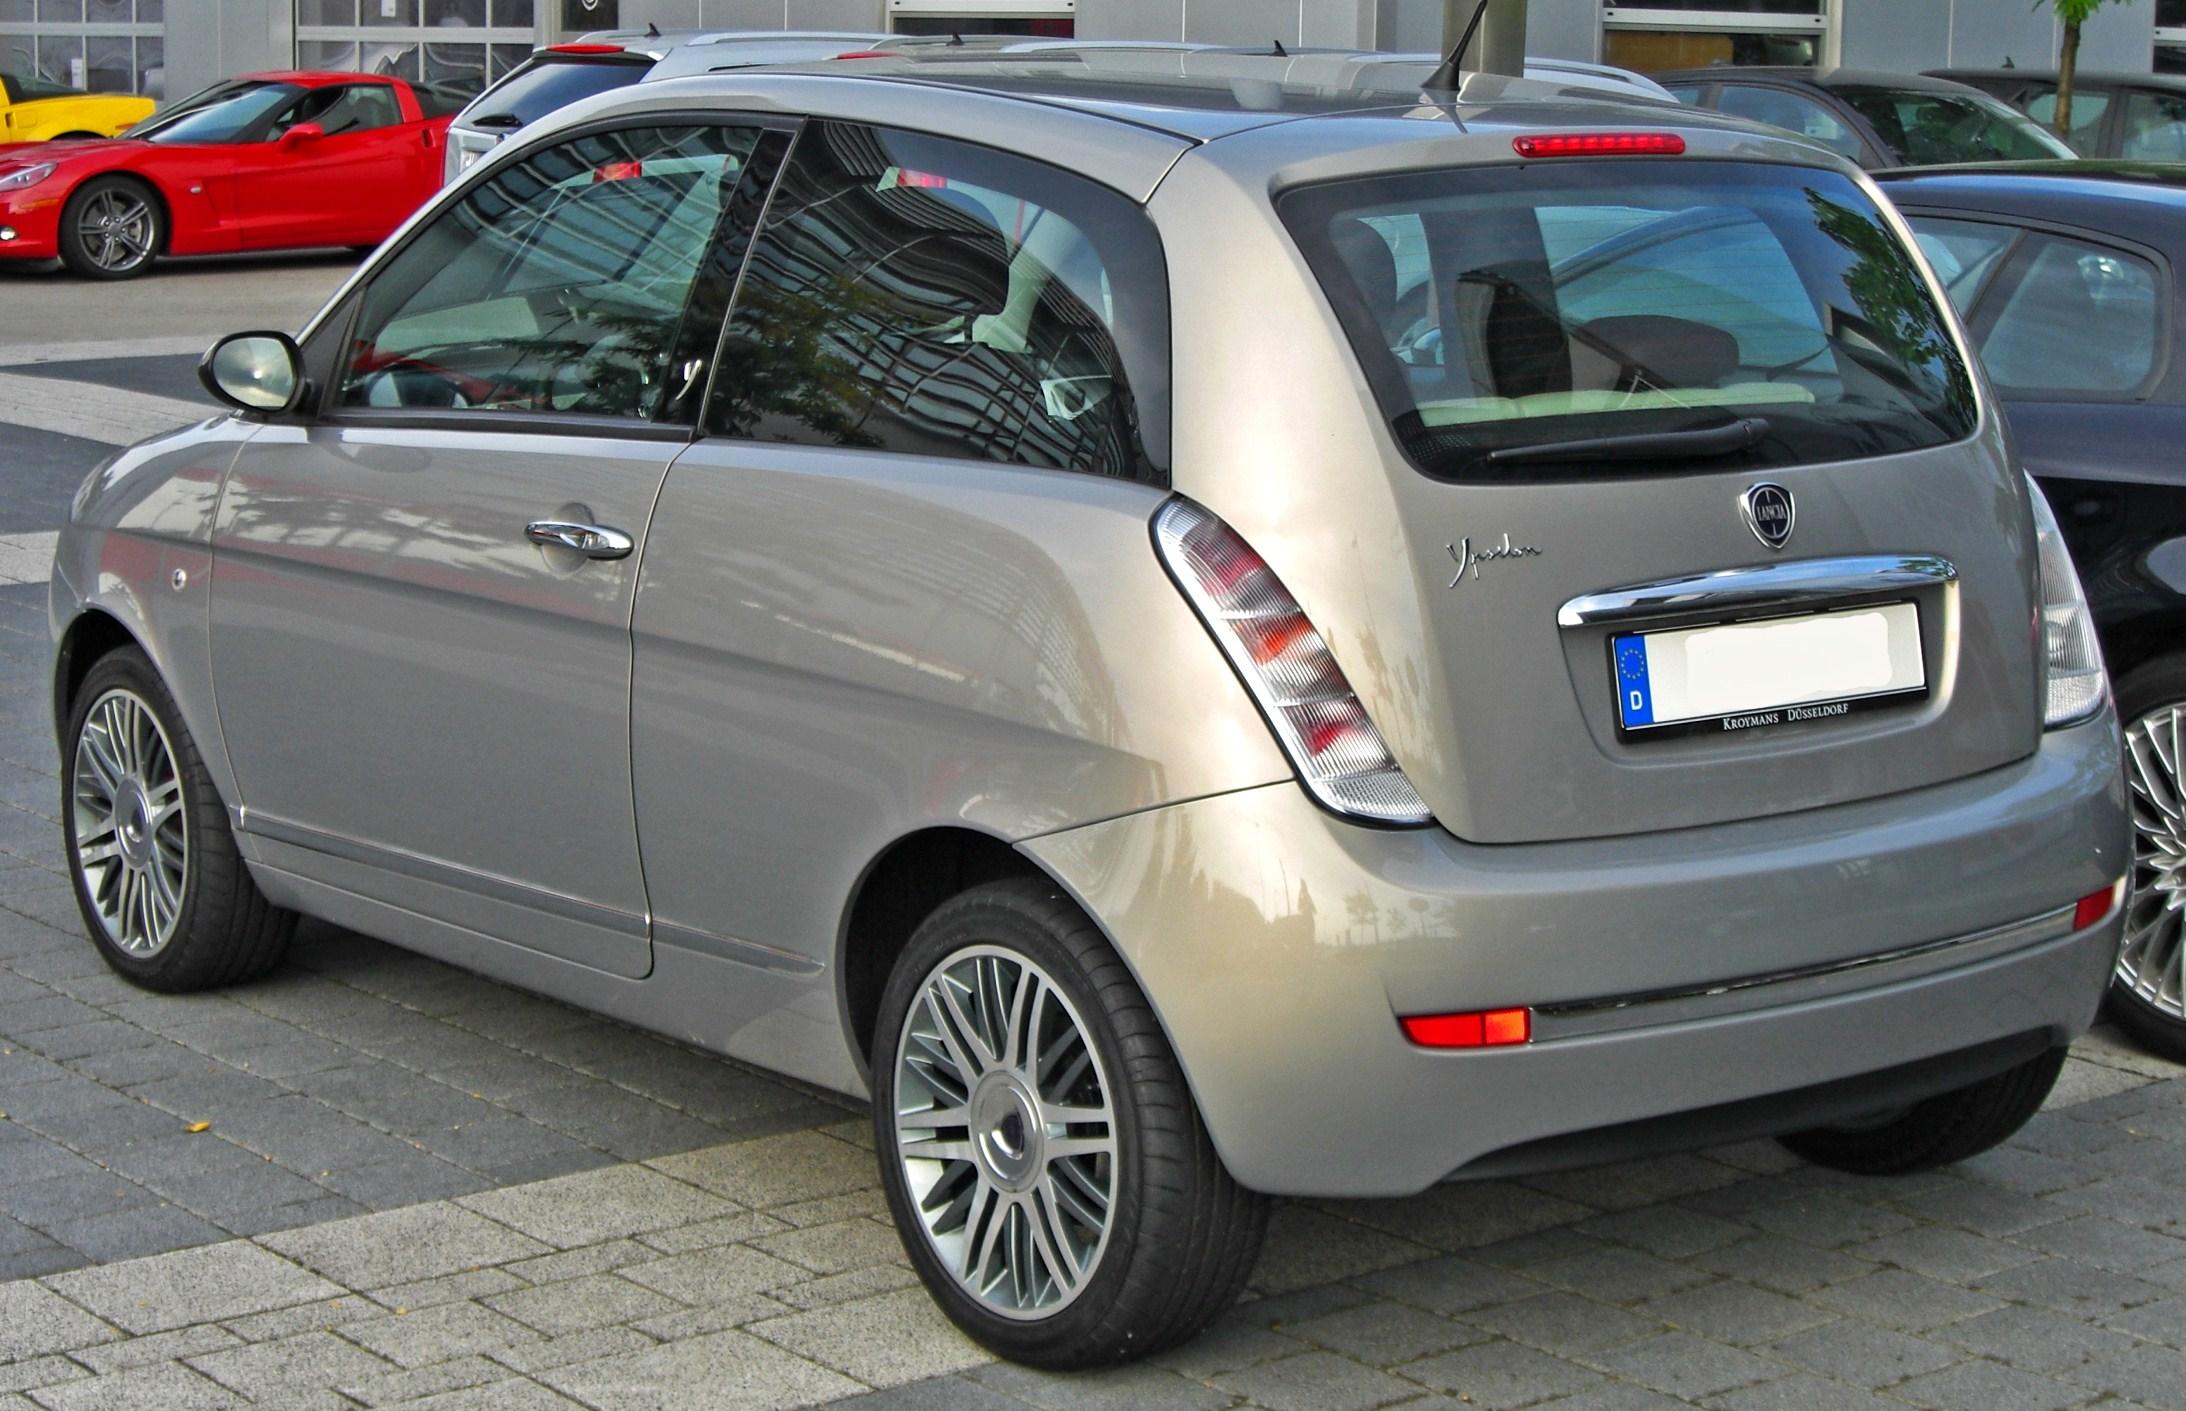 Lancia Ypsilon 0.9 TwinAir Elefantino Stop&Start 5p neuve  Achat Ypsilon neuve